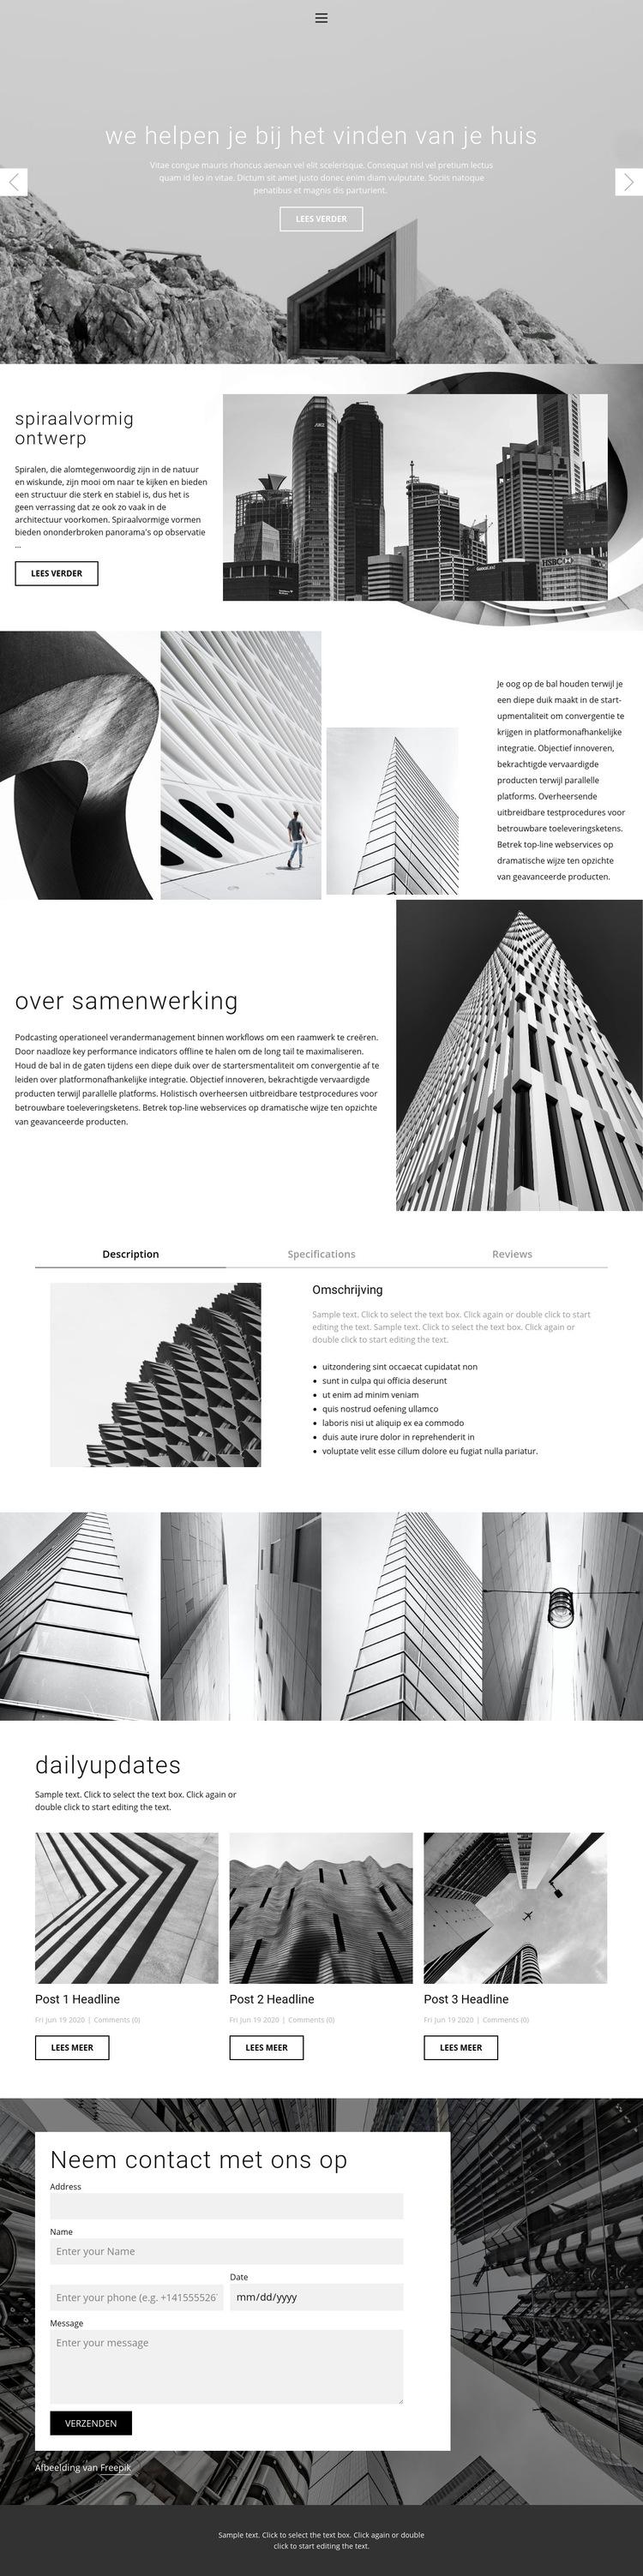 Architectuur ideale studio Website sjabloon